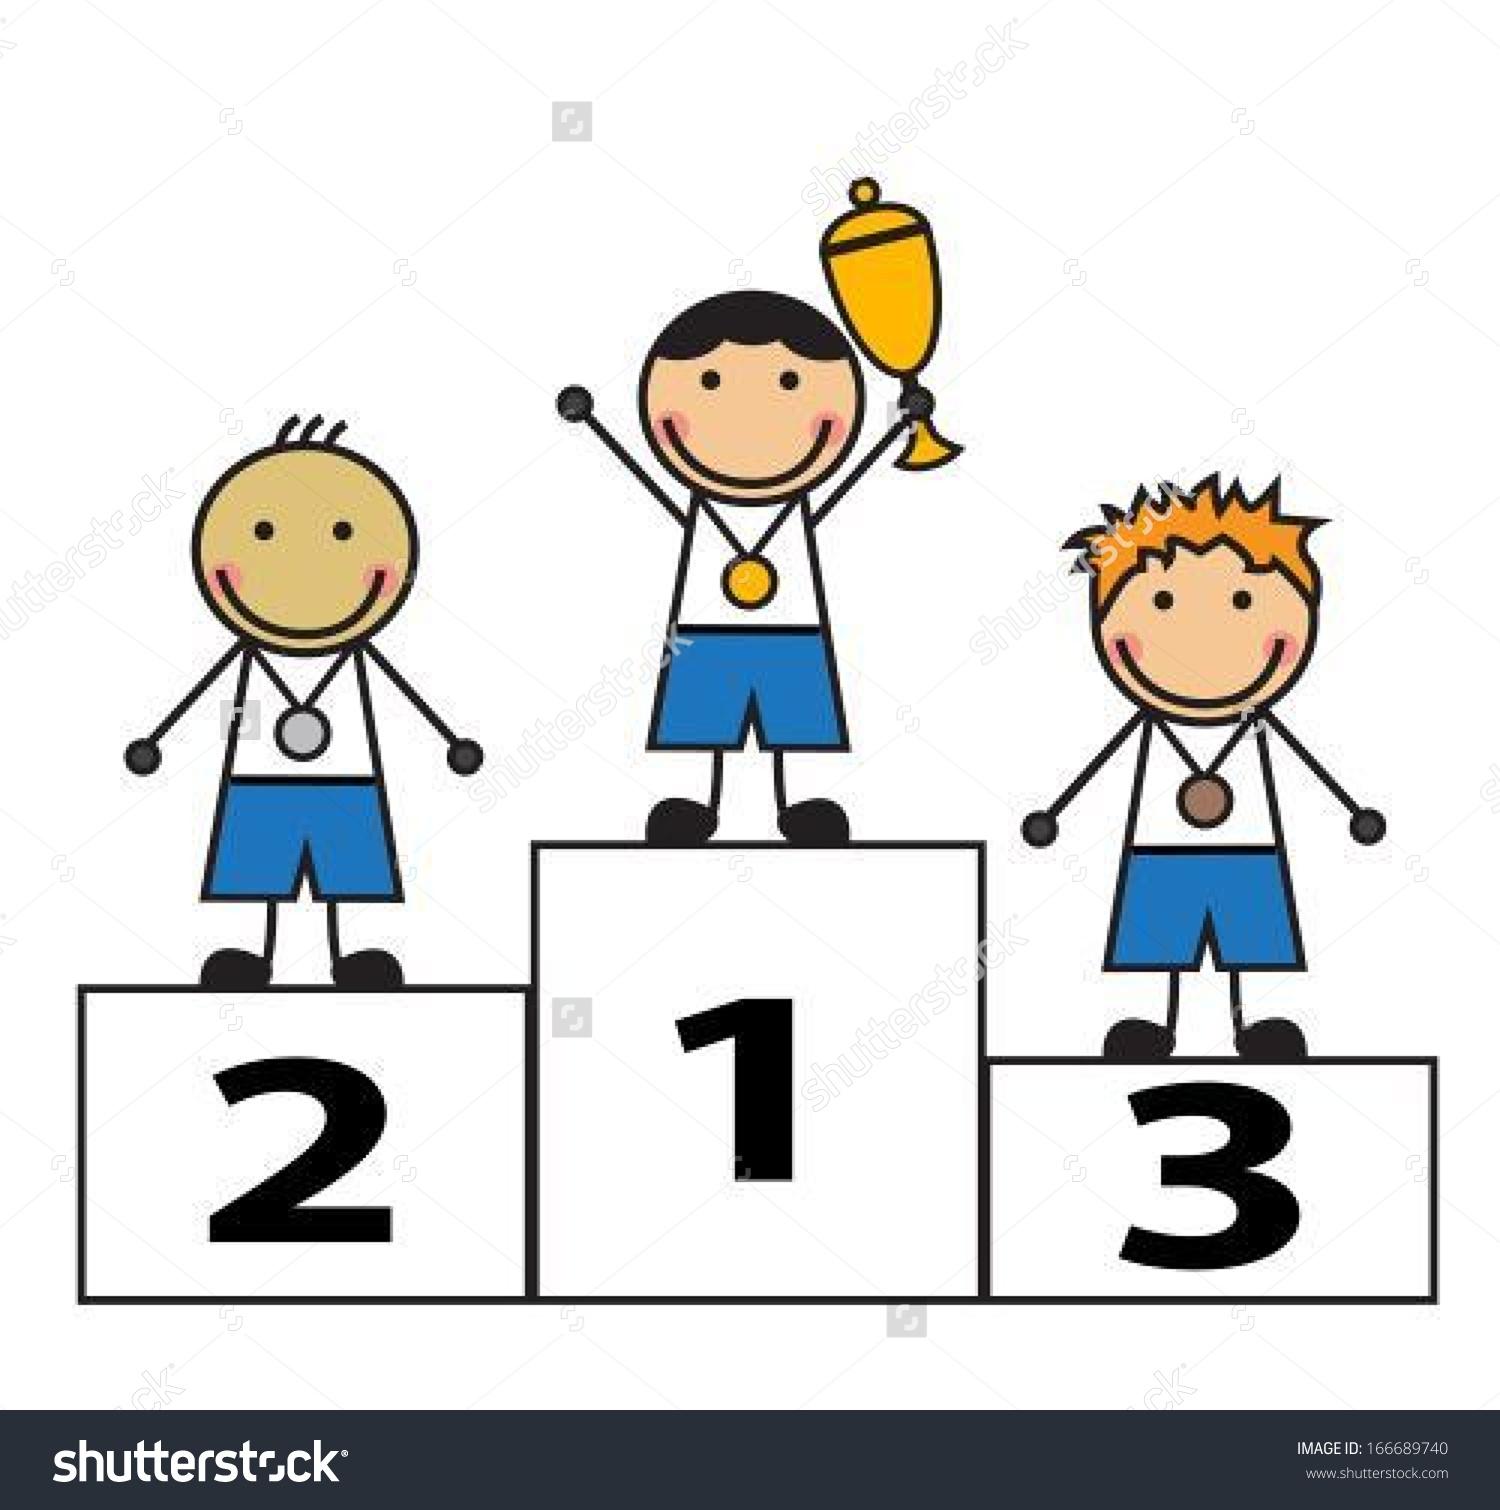 Cartoon Men Stand On Podium Winners Stock Vector 166689740.